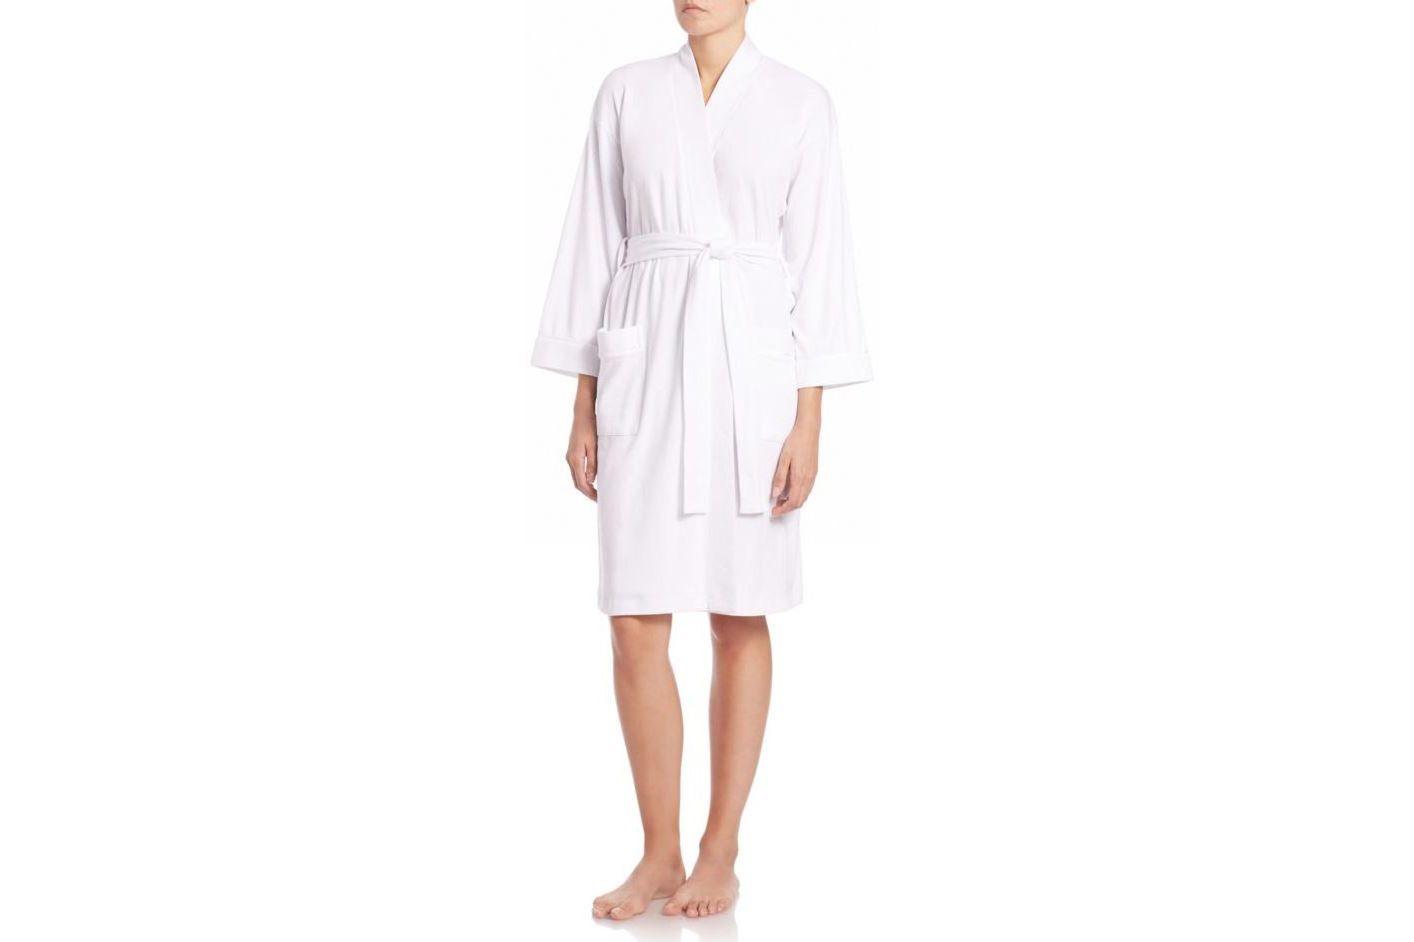 Pima Cotton Jersey Robe